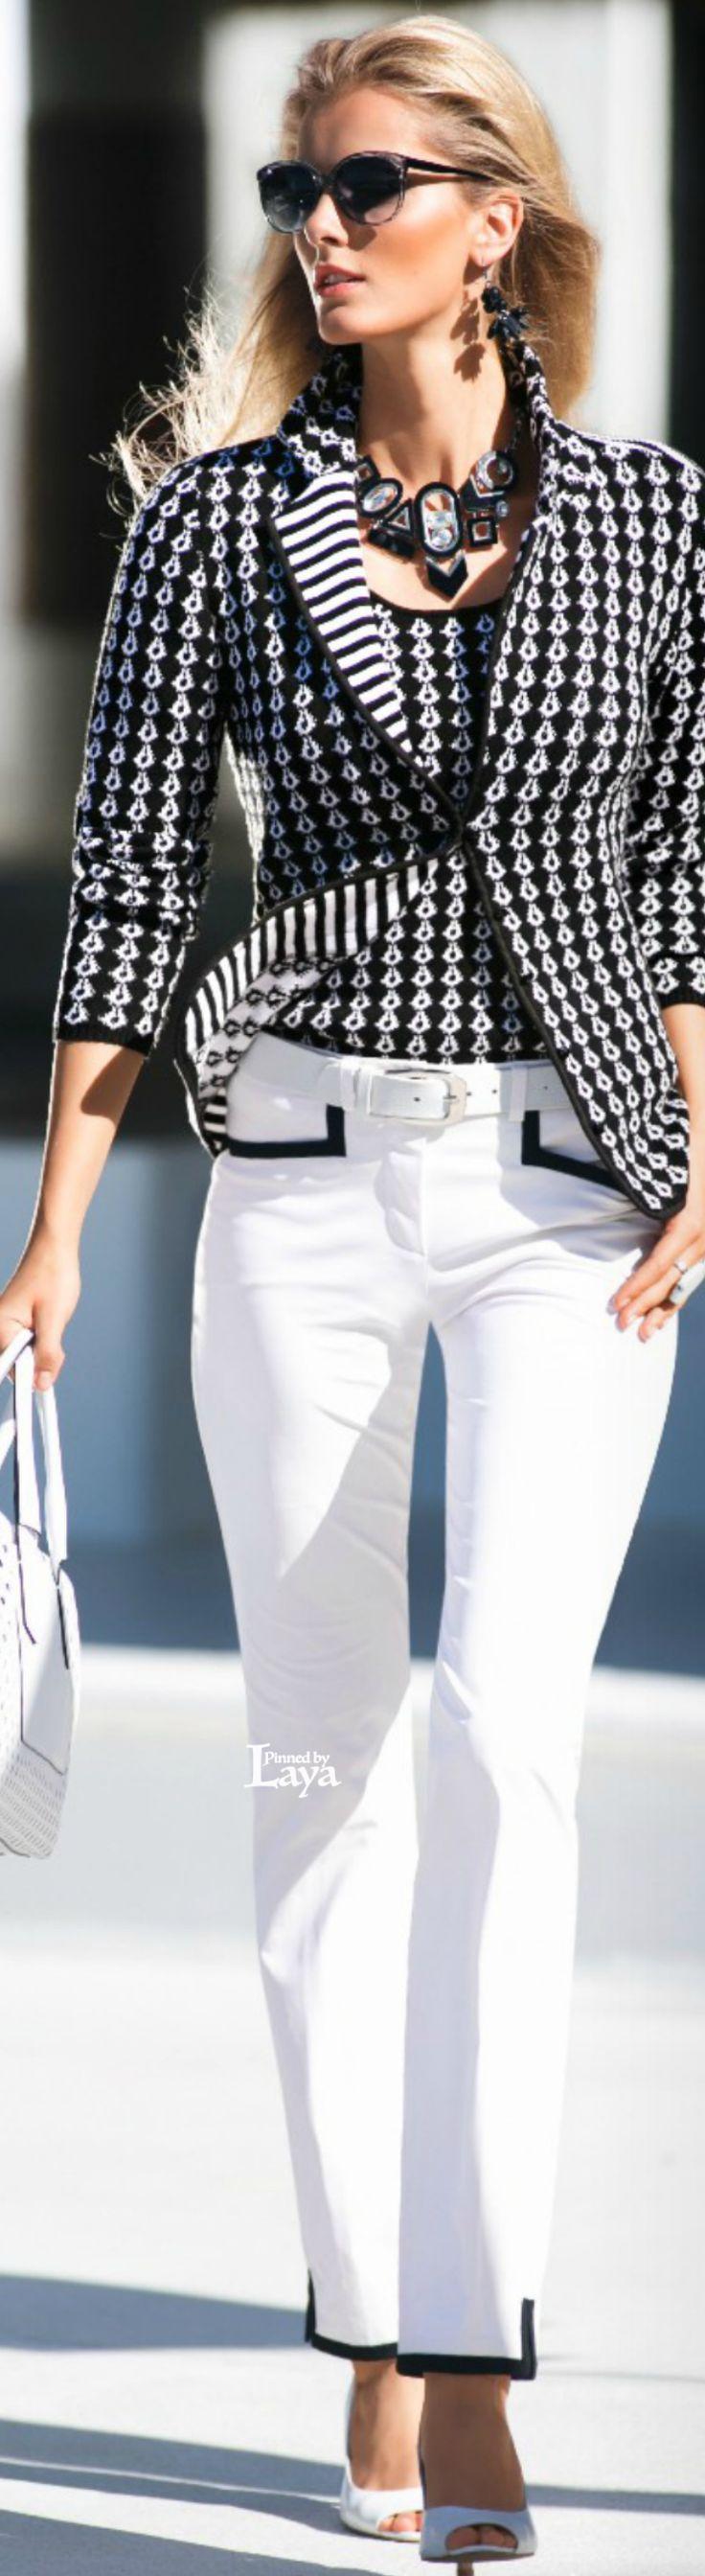 Wonderful Long Blazer On Pinterest  Kimono Fashion 2014 Ivy Sullivan And Interview Cl